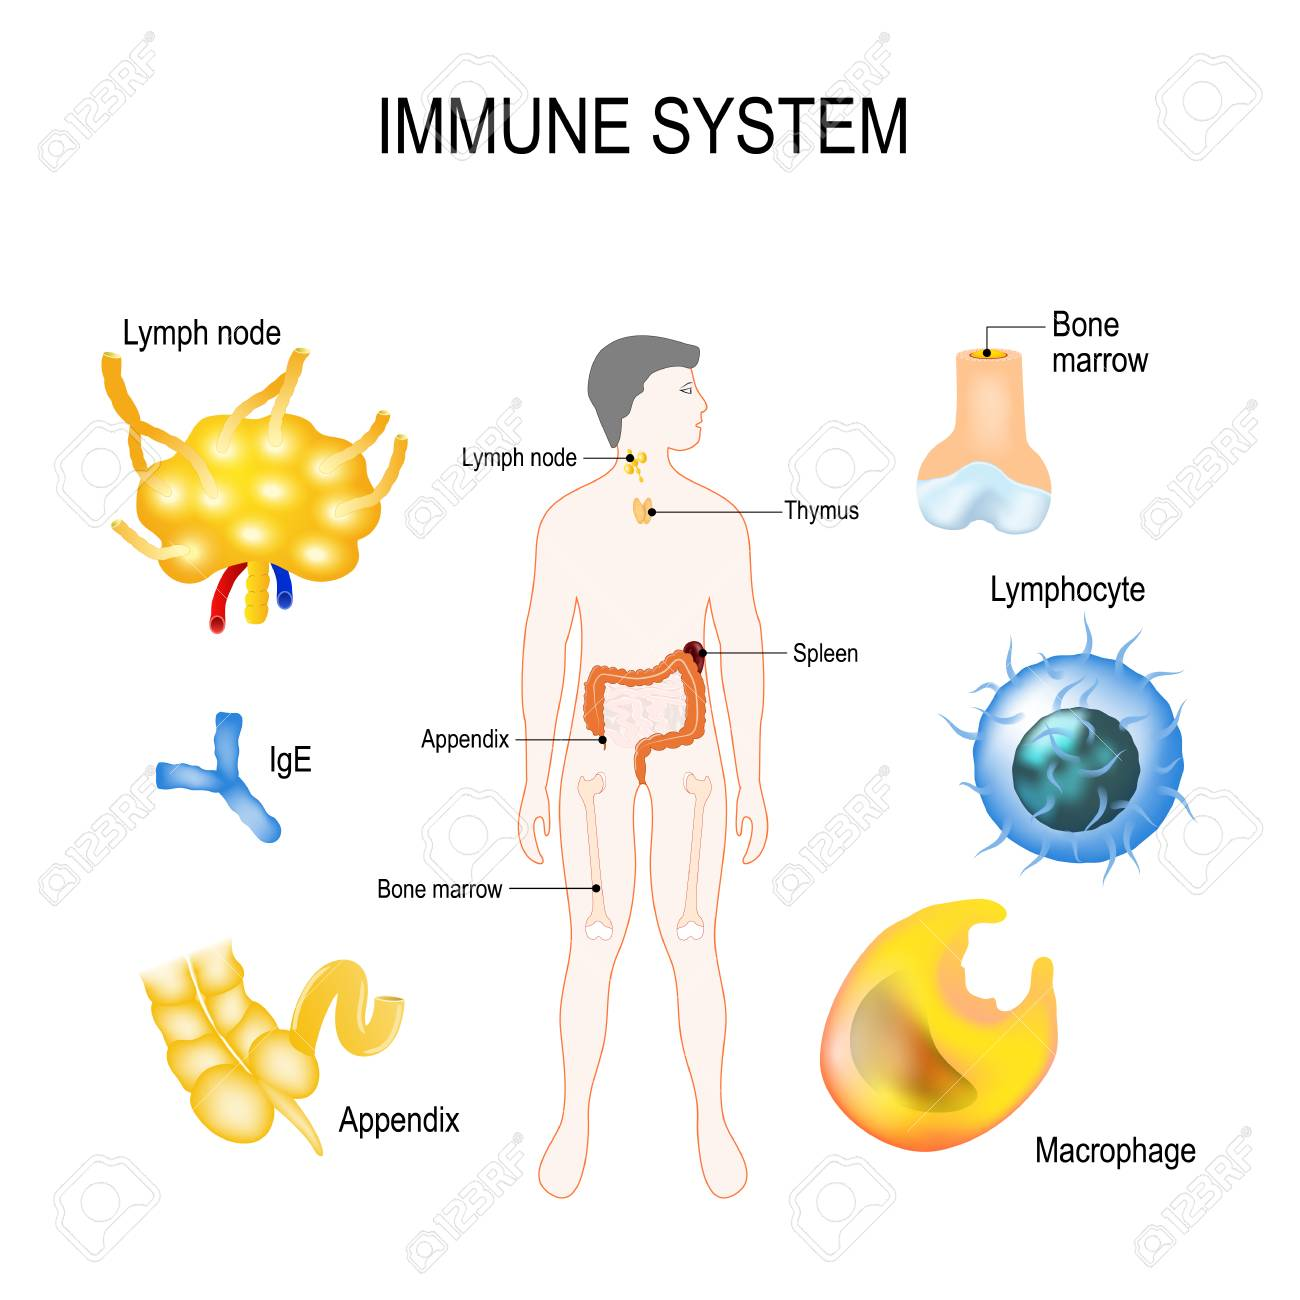 Sistema Inmune: Corte Transversal Del Hueso, IgE, Ganglio Linfático ...